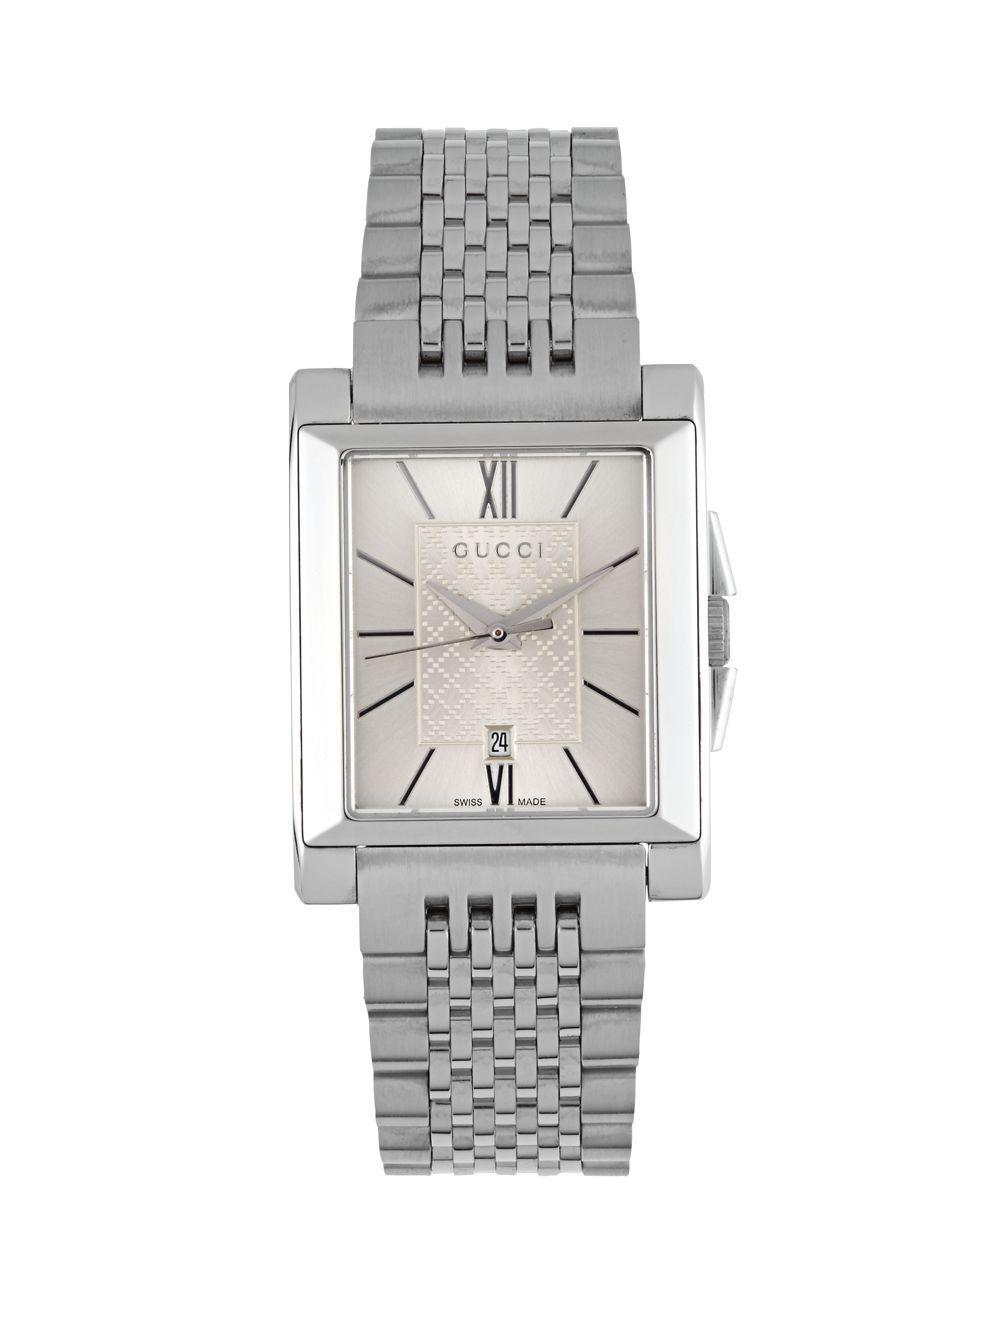 31cb7e60efb Lyst - Gucci Stainless Steel Quartz Watch in Metallic